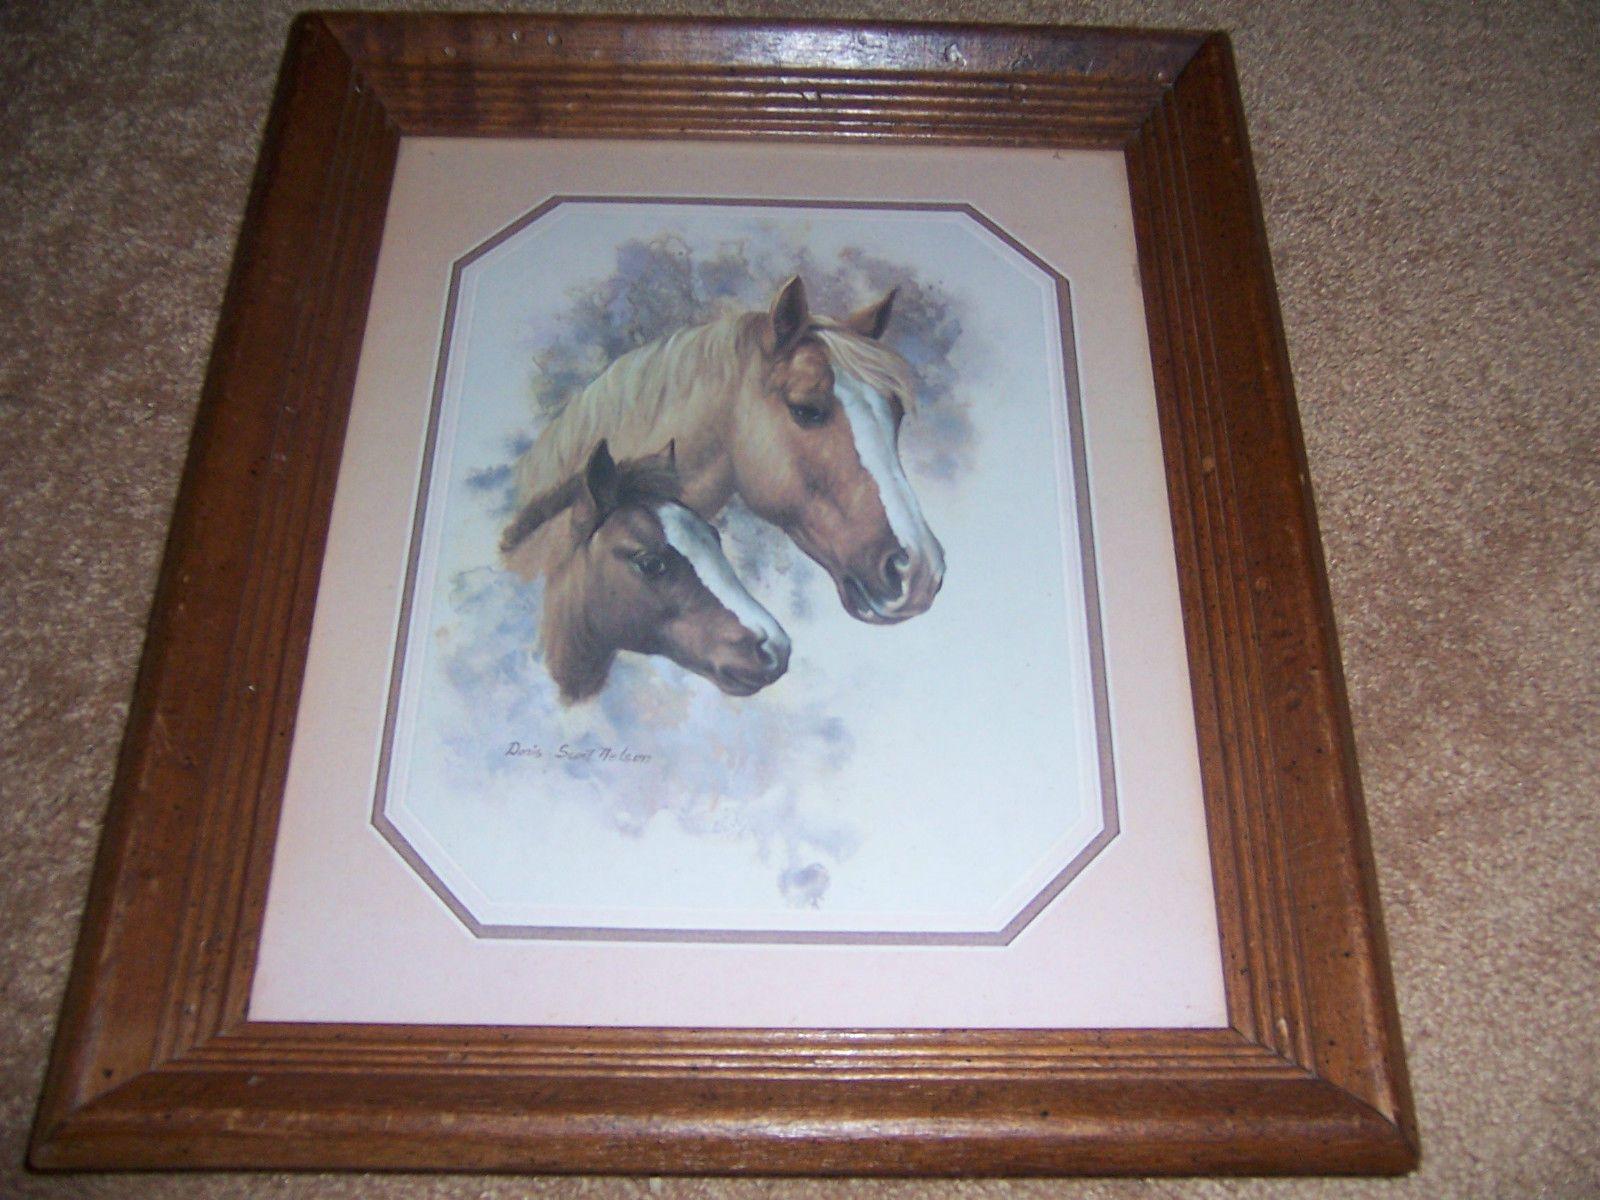 HOMCO Details about VINTAGE 20&20;S FRAMED PICTURE HORSES 20